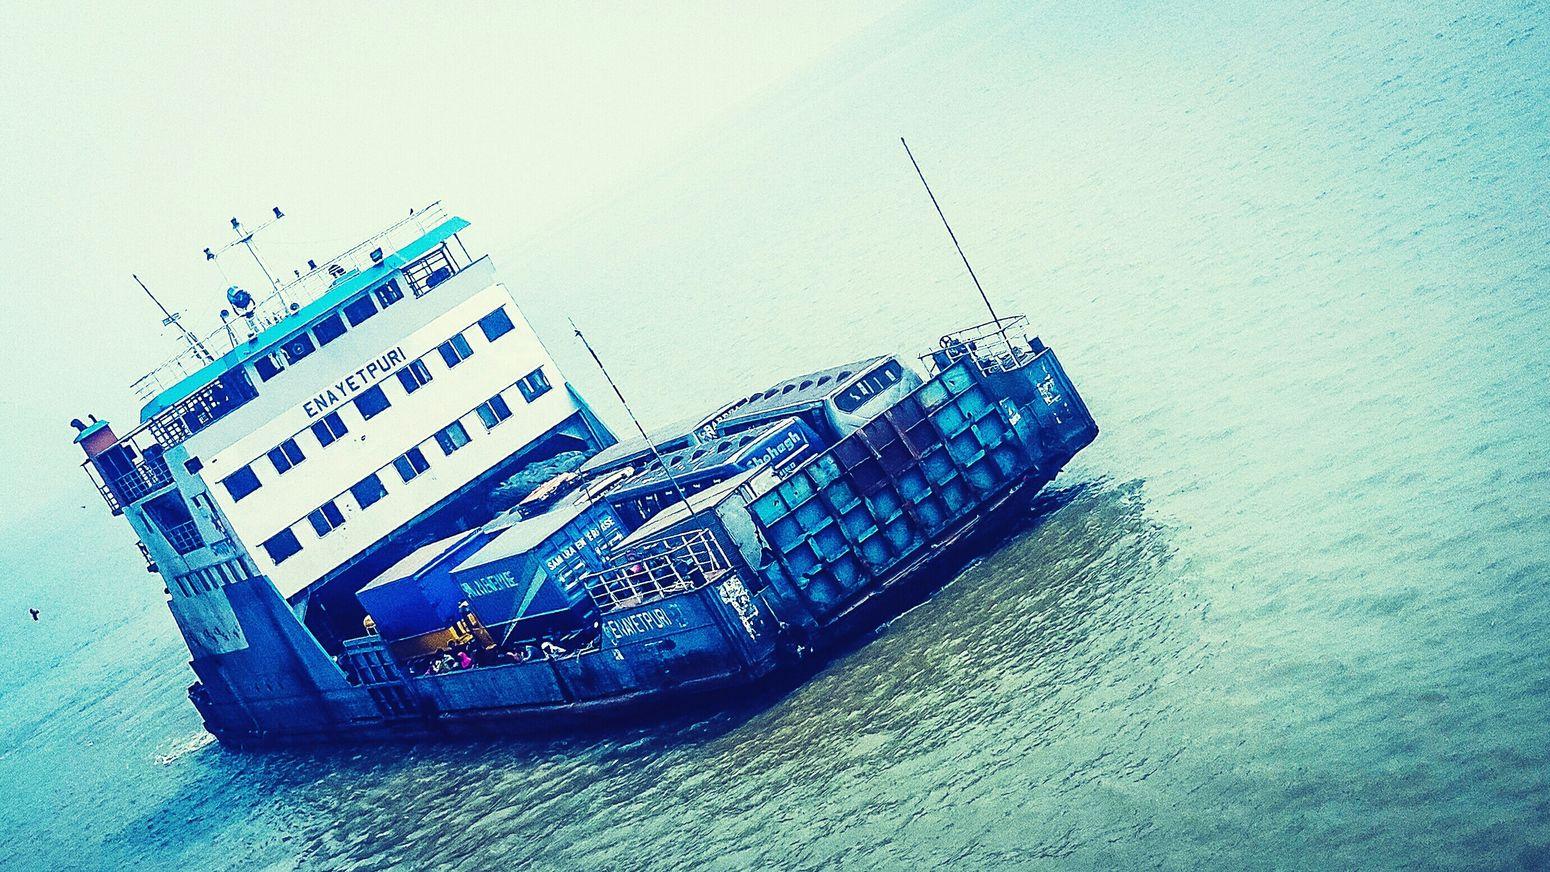 Ferry Journeyphotography Randomclick Timepass Galaxys5click